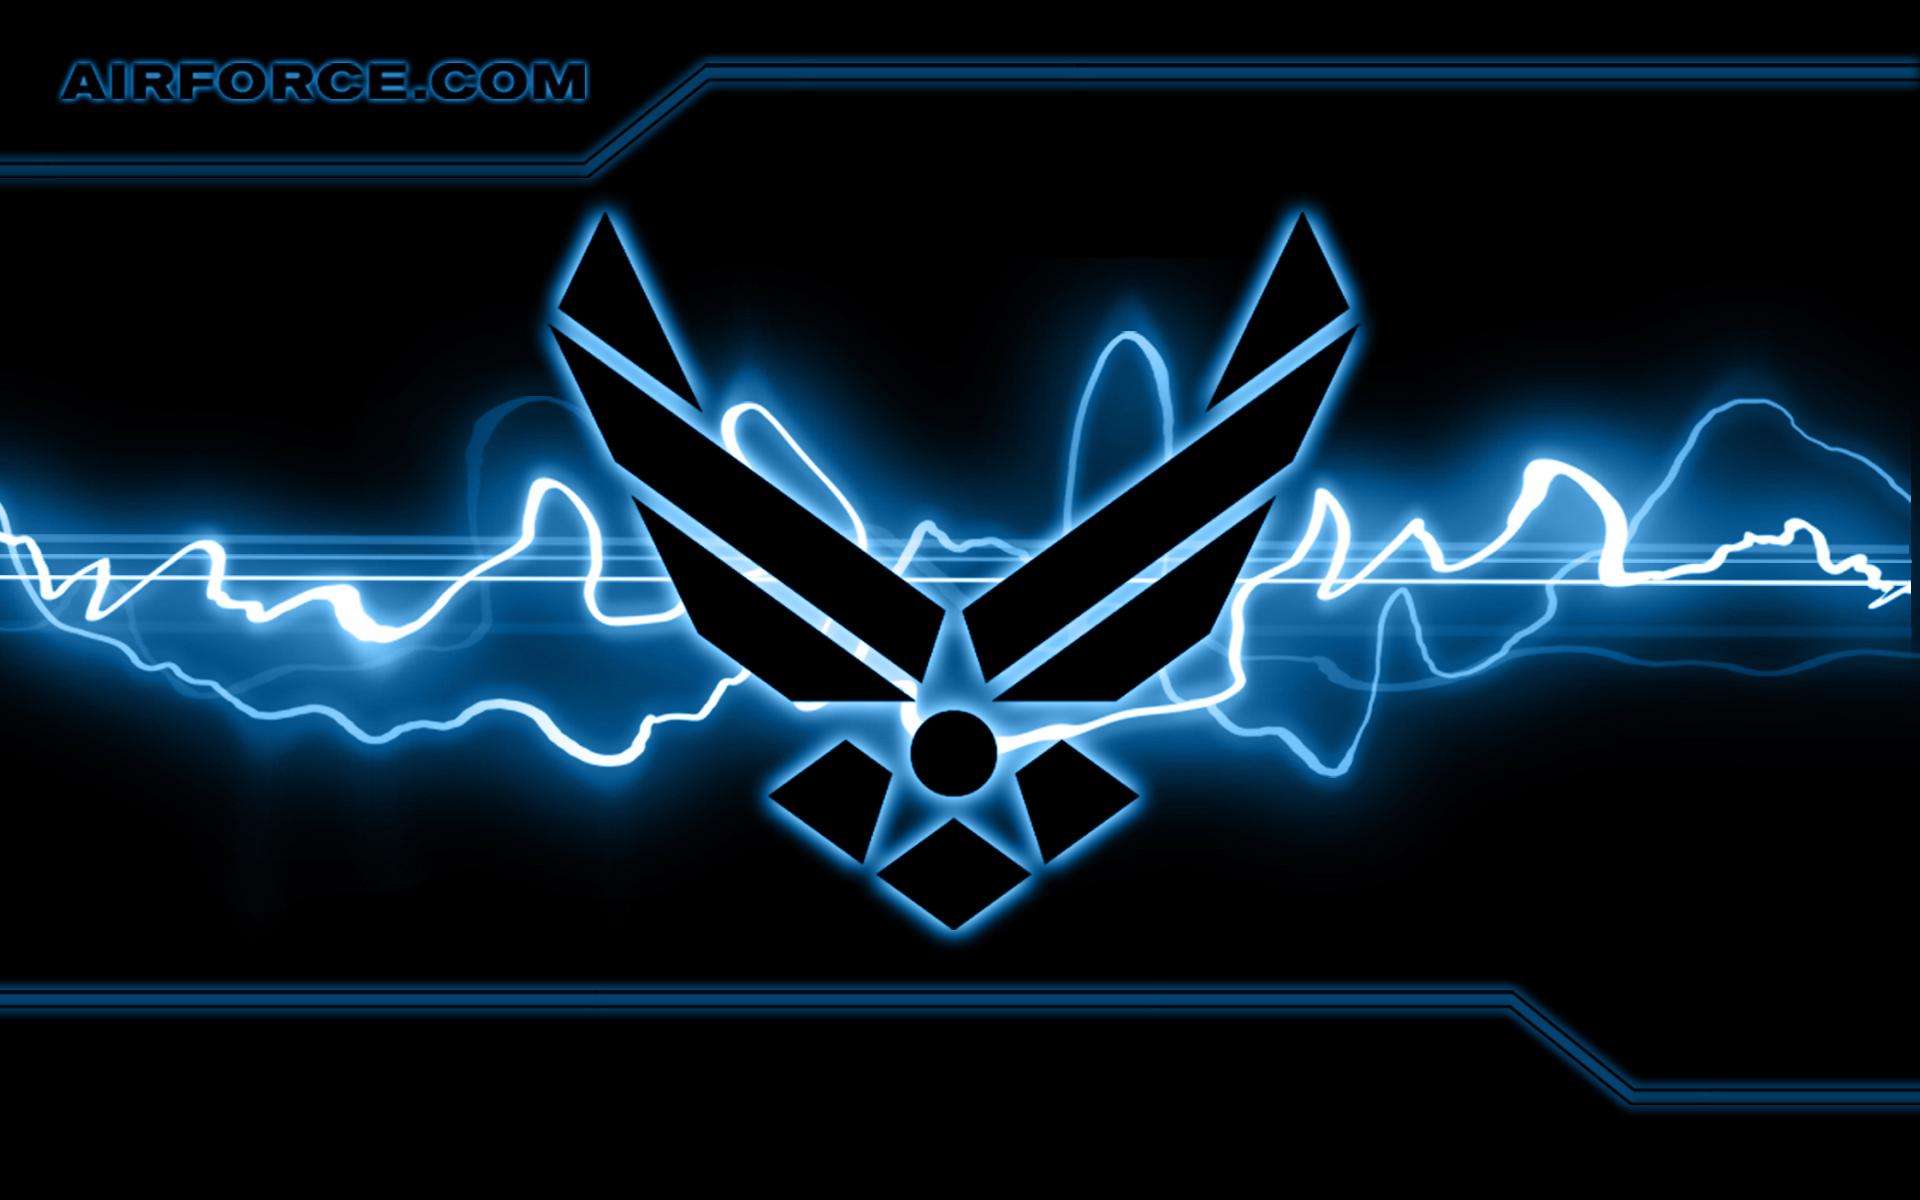 Air Force Emblem Wallpaper Hd At scott air force base 1920x1200